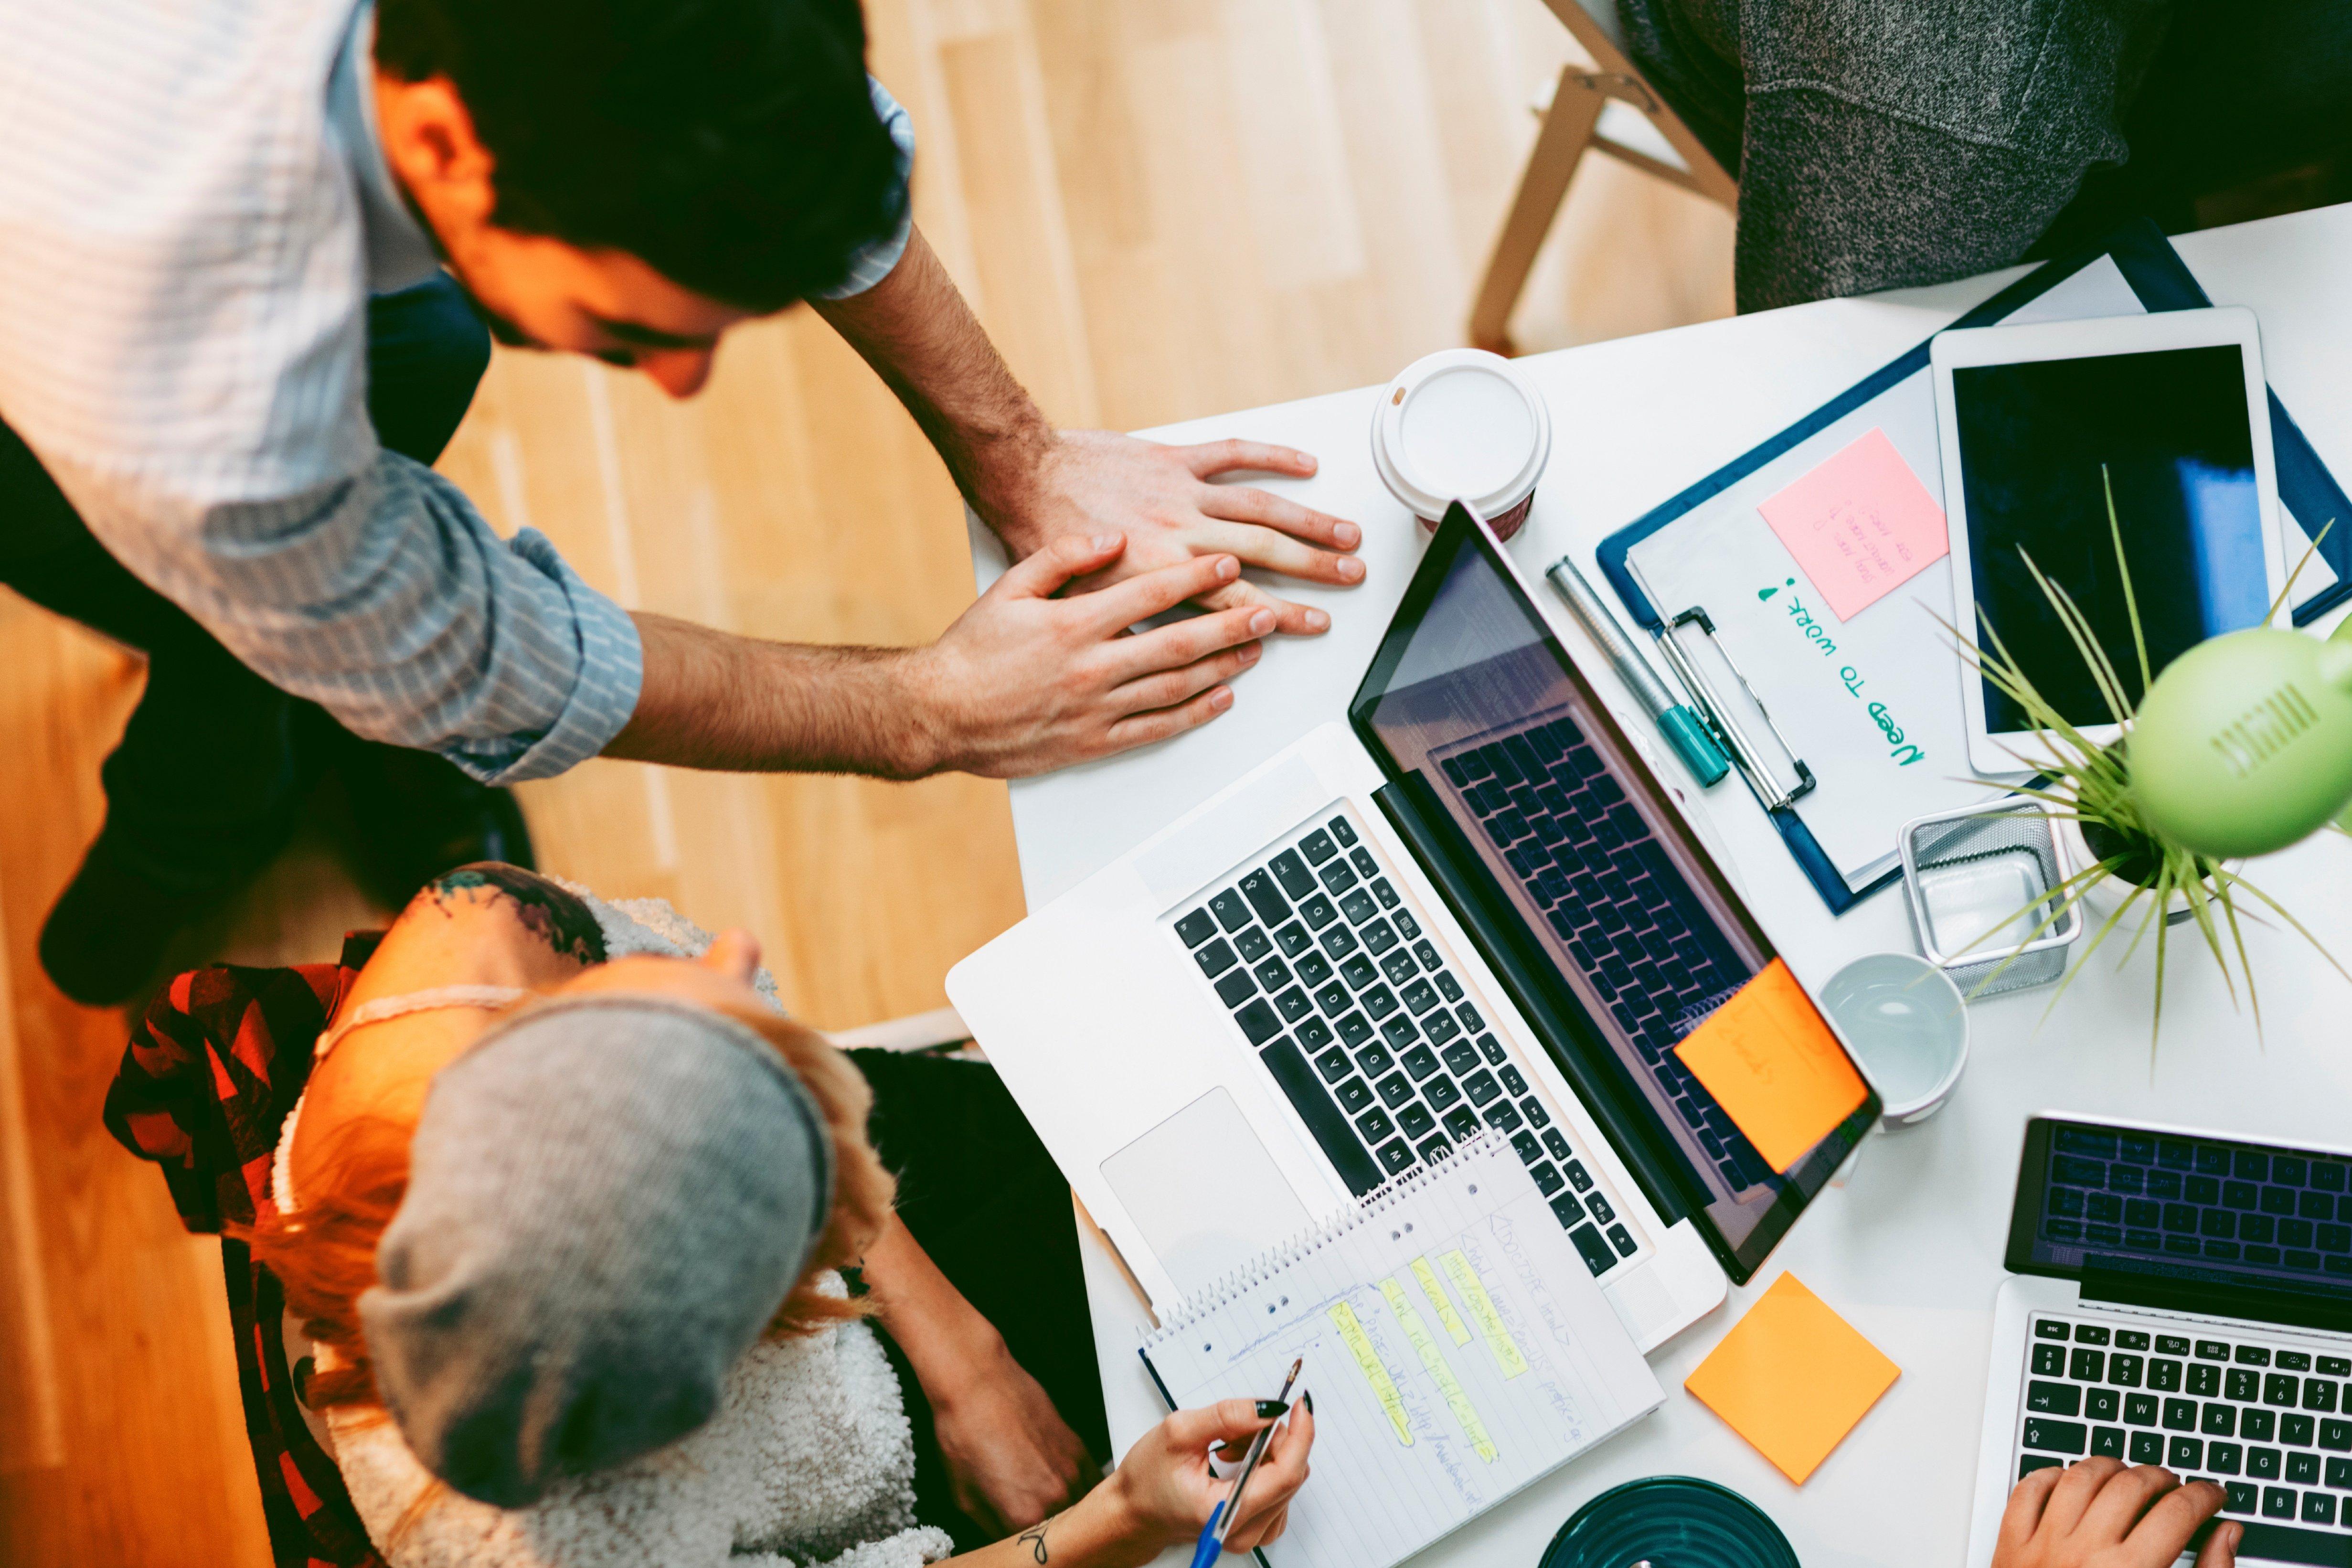 Development_Team_Cooperating_In_Their_Office.jpg